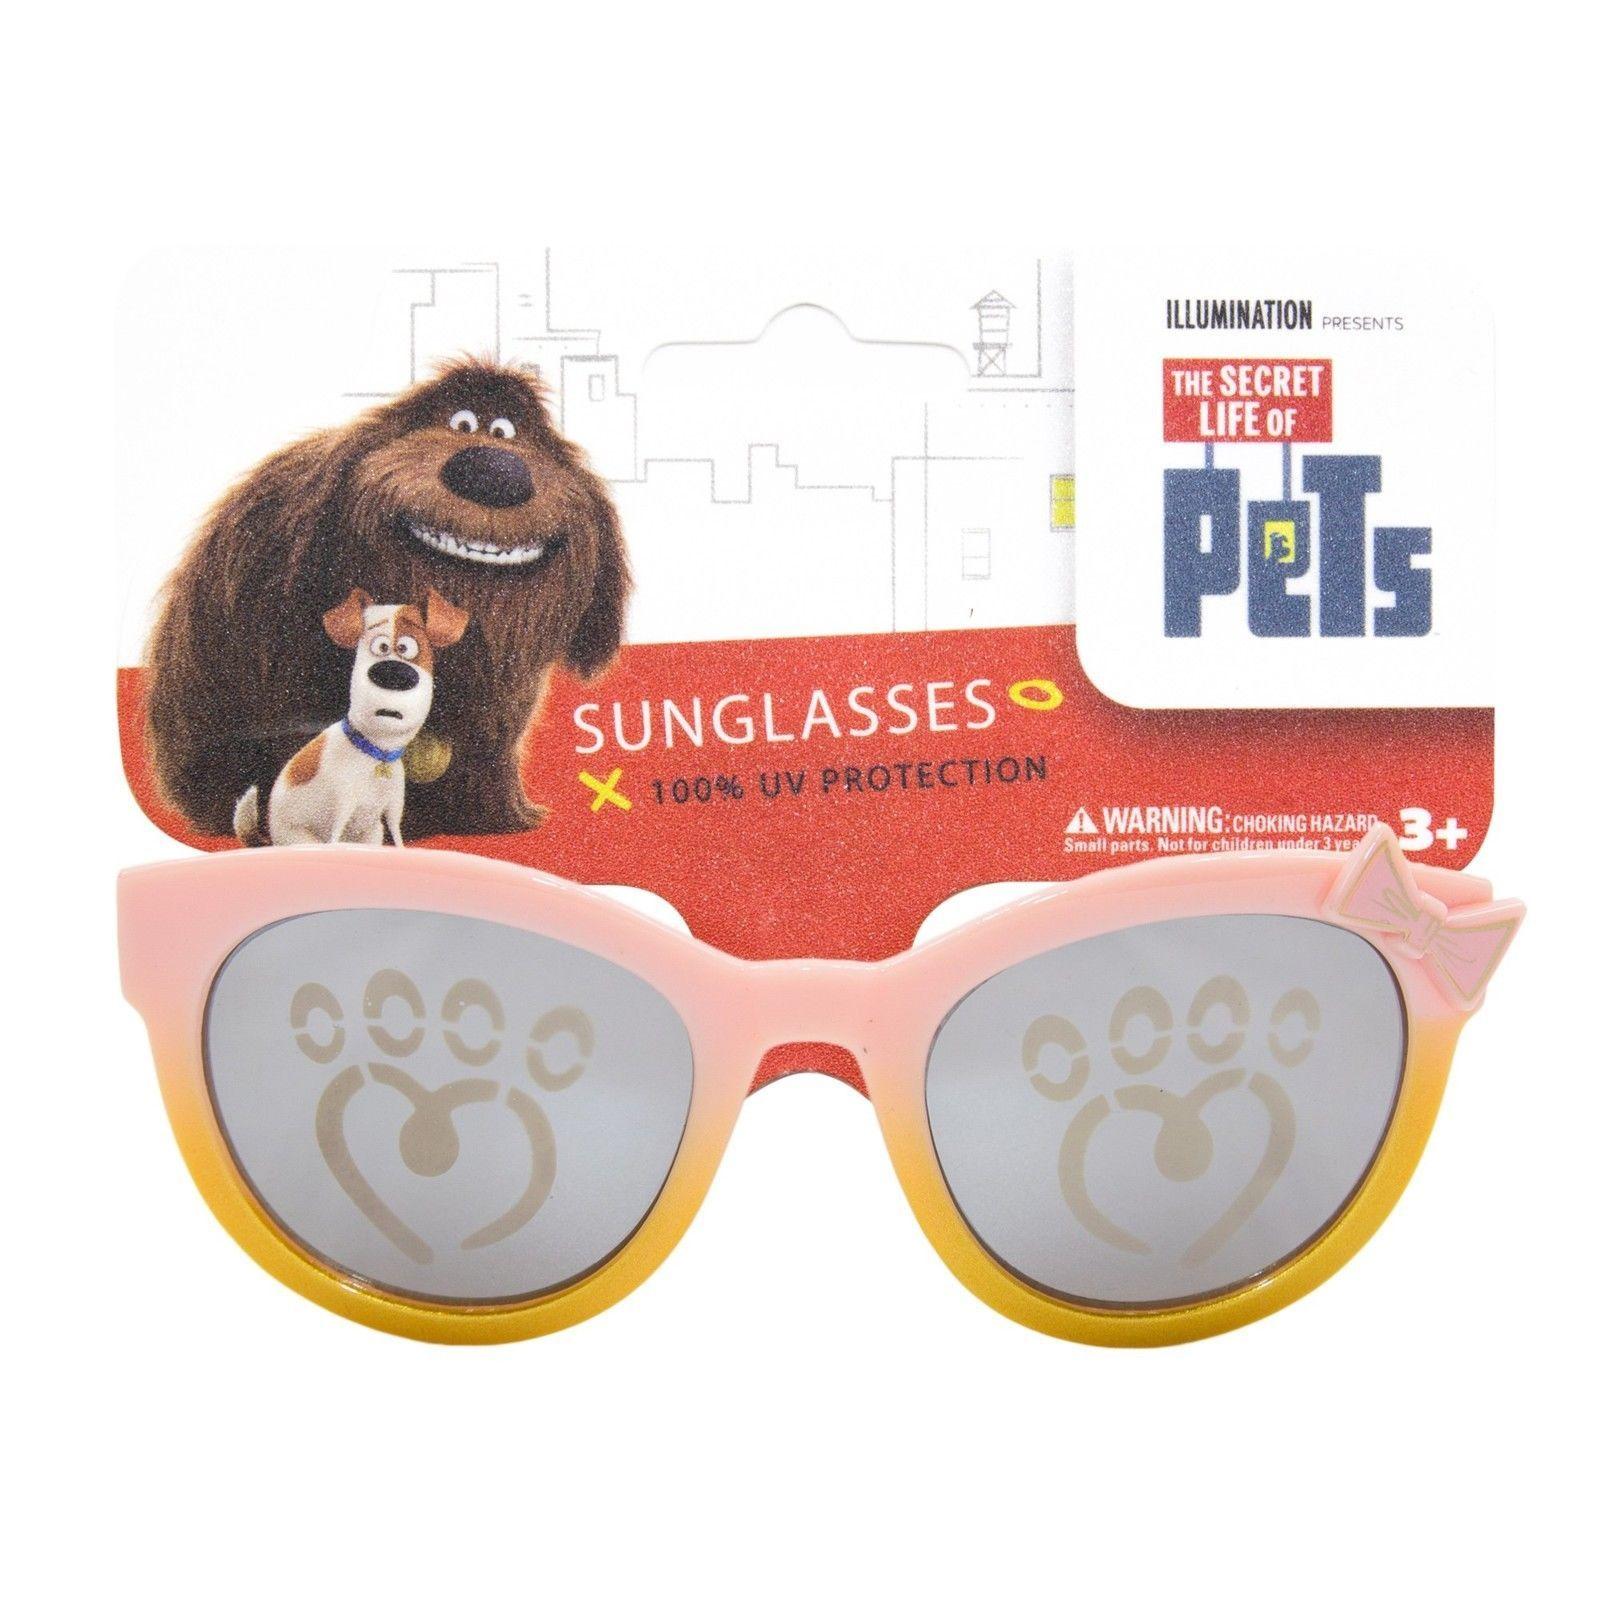 57f2da7b37 NBC Universal Secret Life of Pets Kids and 50 similar items